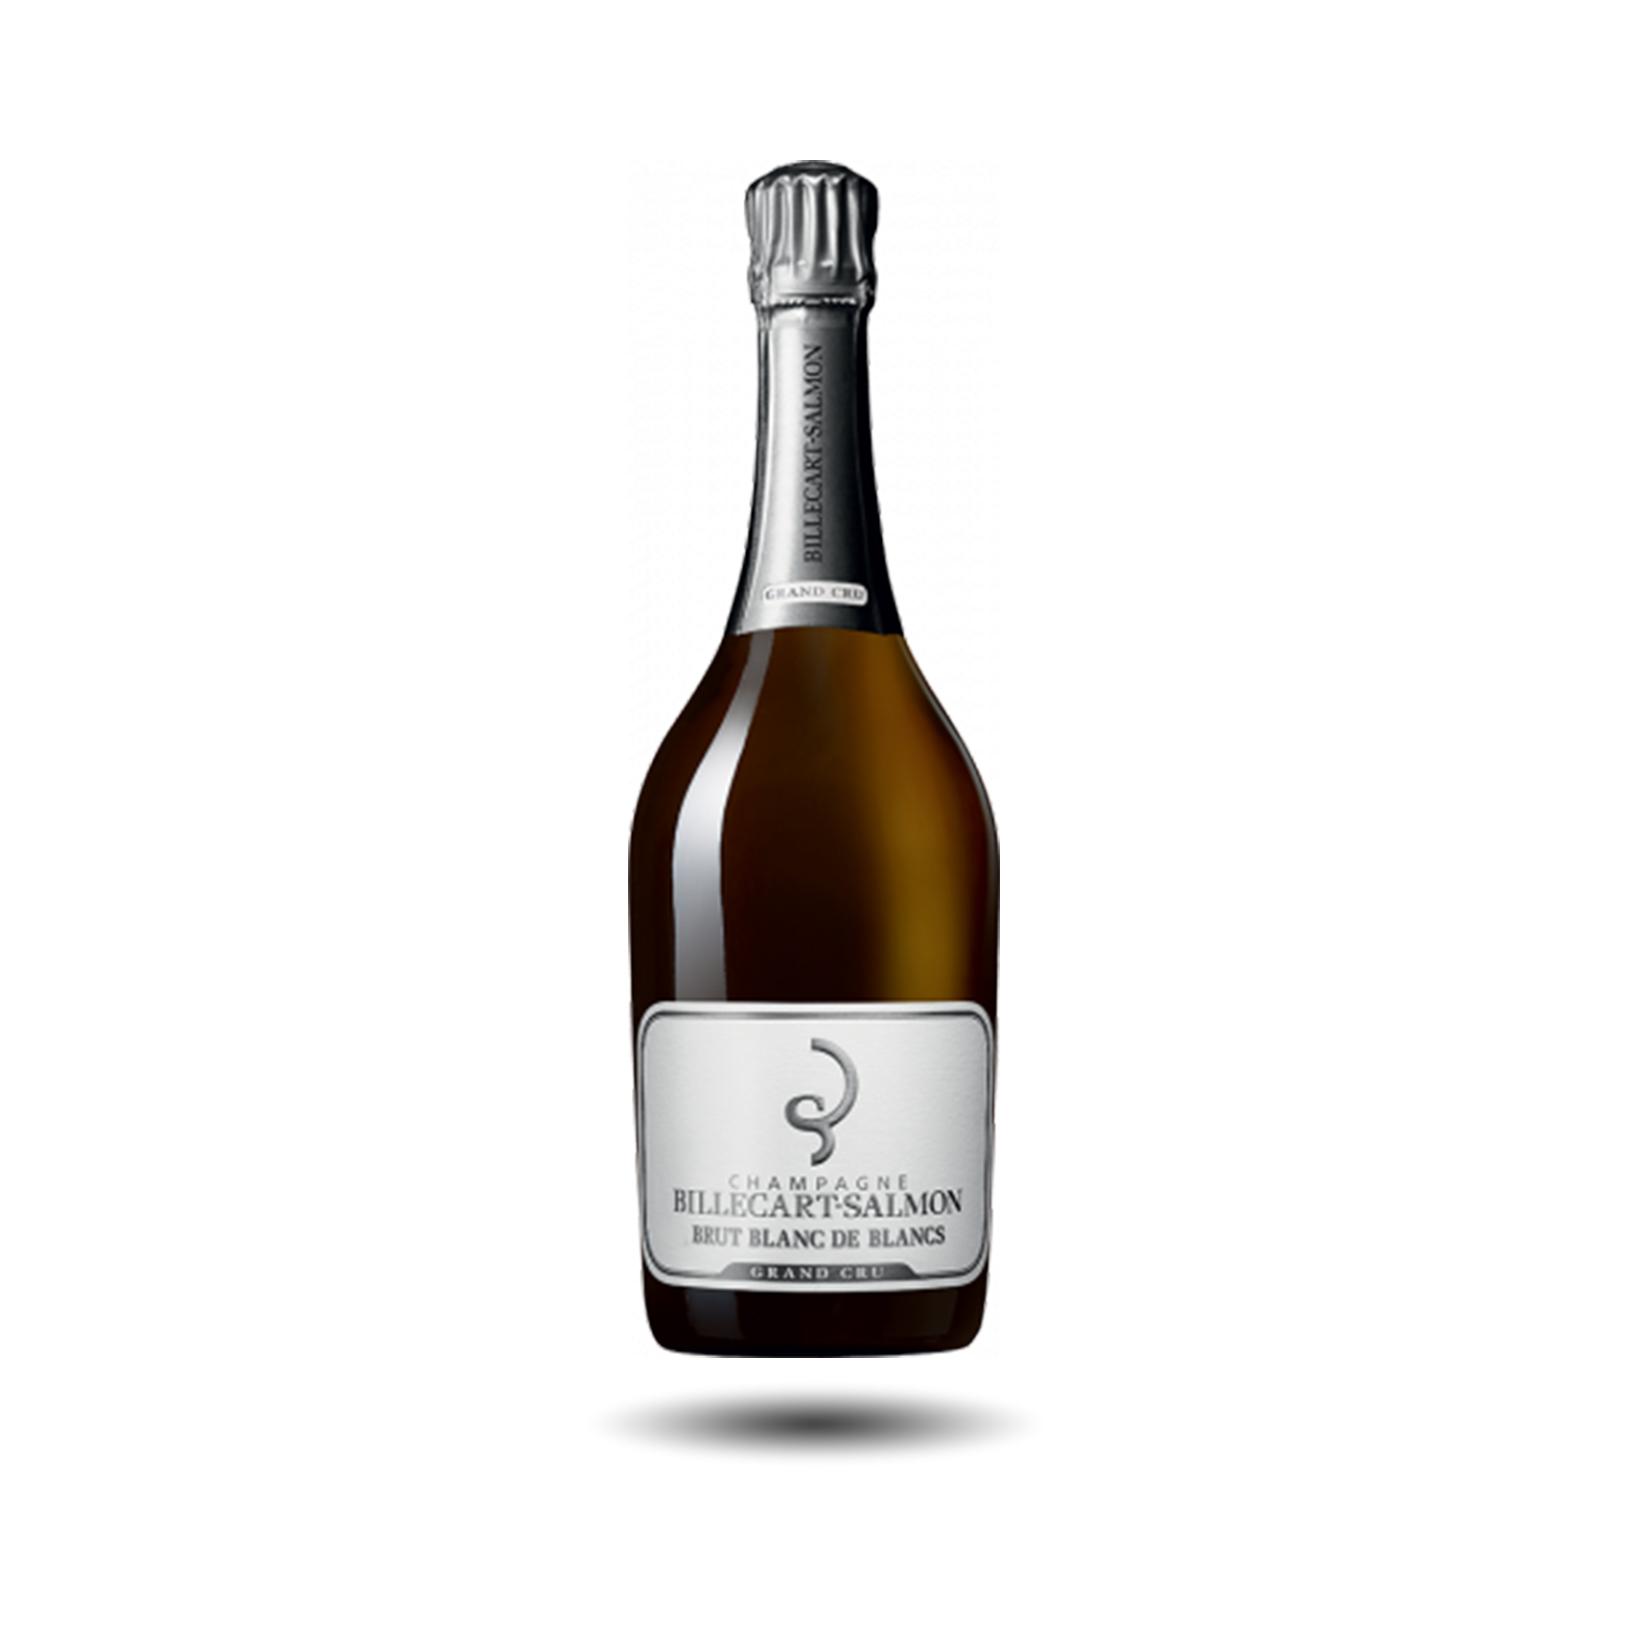 Champagne Billecart-Salmon - Grand Cru, Brut Blanc de Blancs